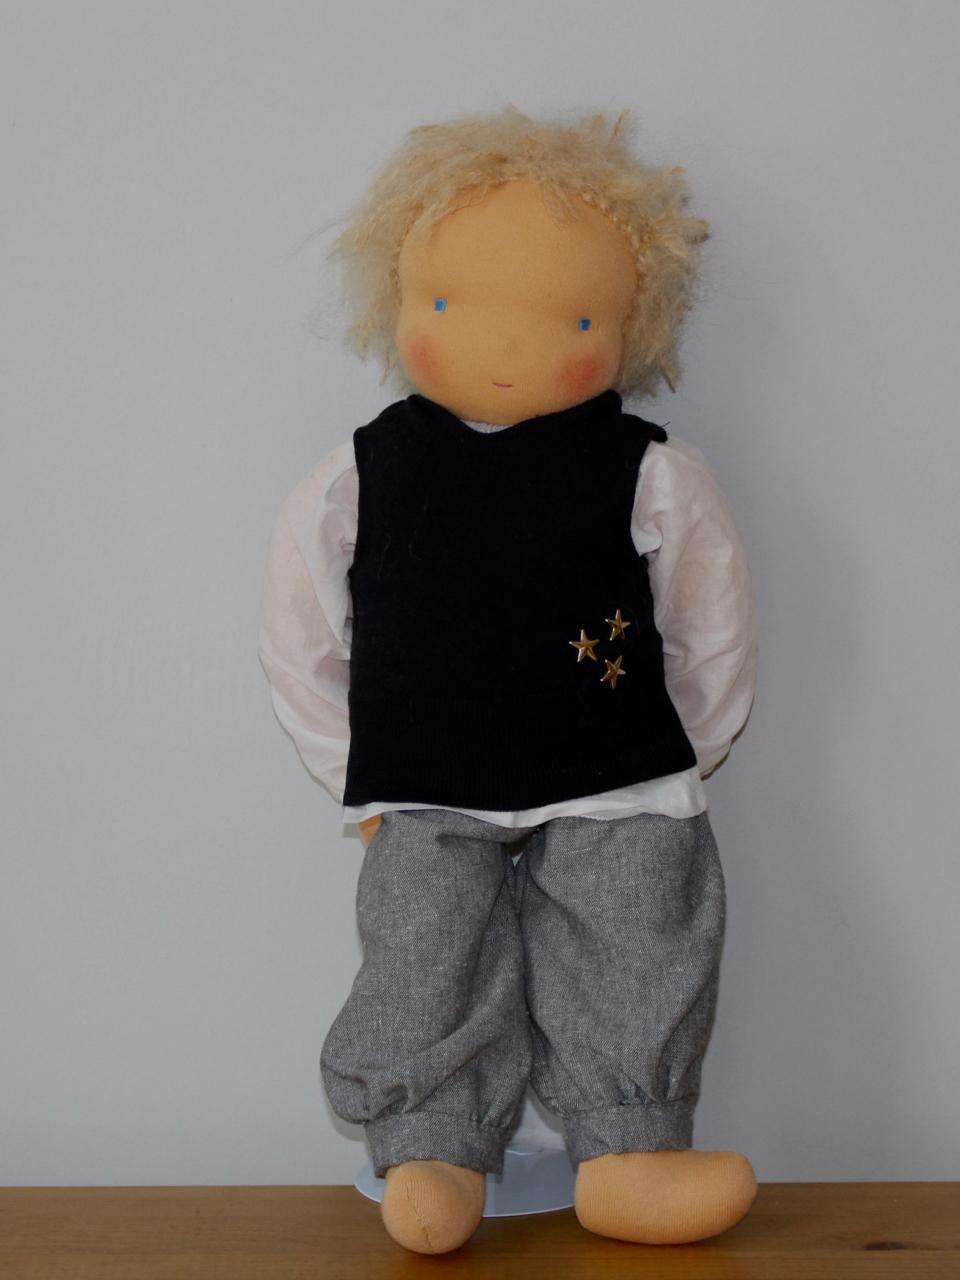 Waldorf doll boy inn black pullunder, blond hair, made by feinslieb